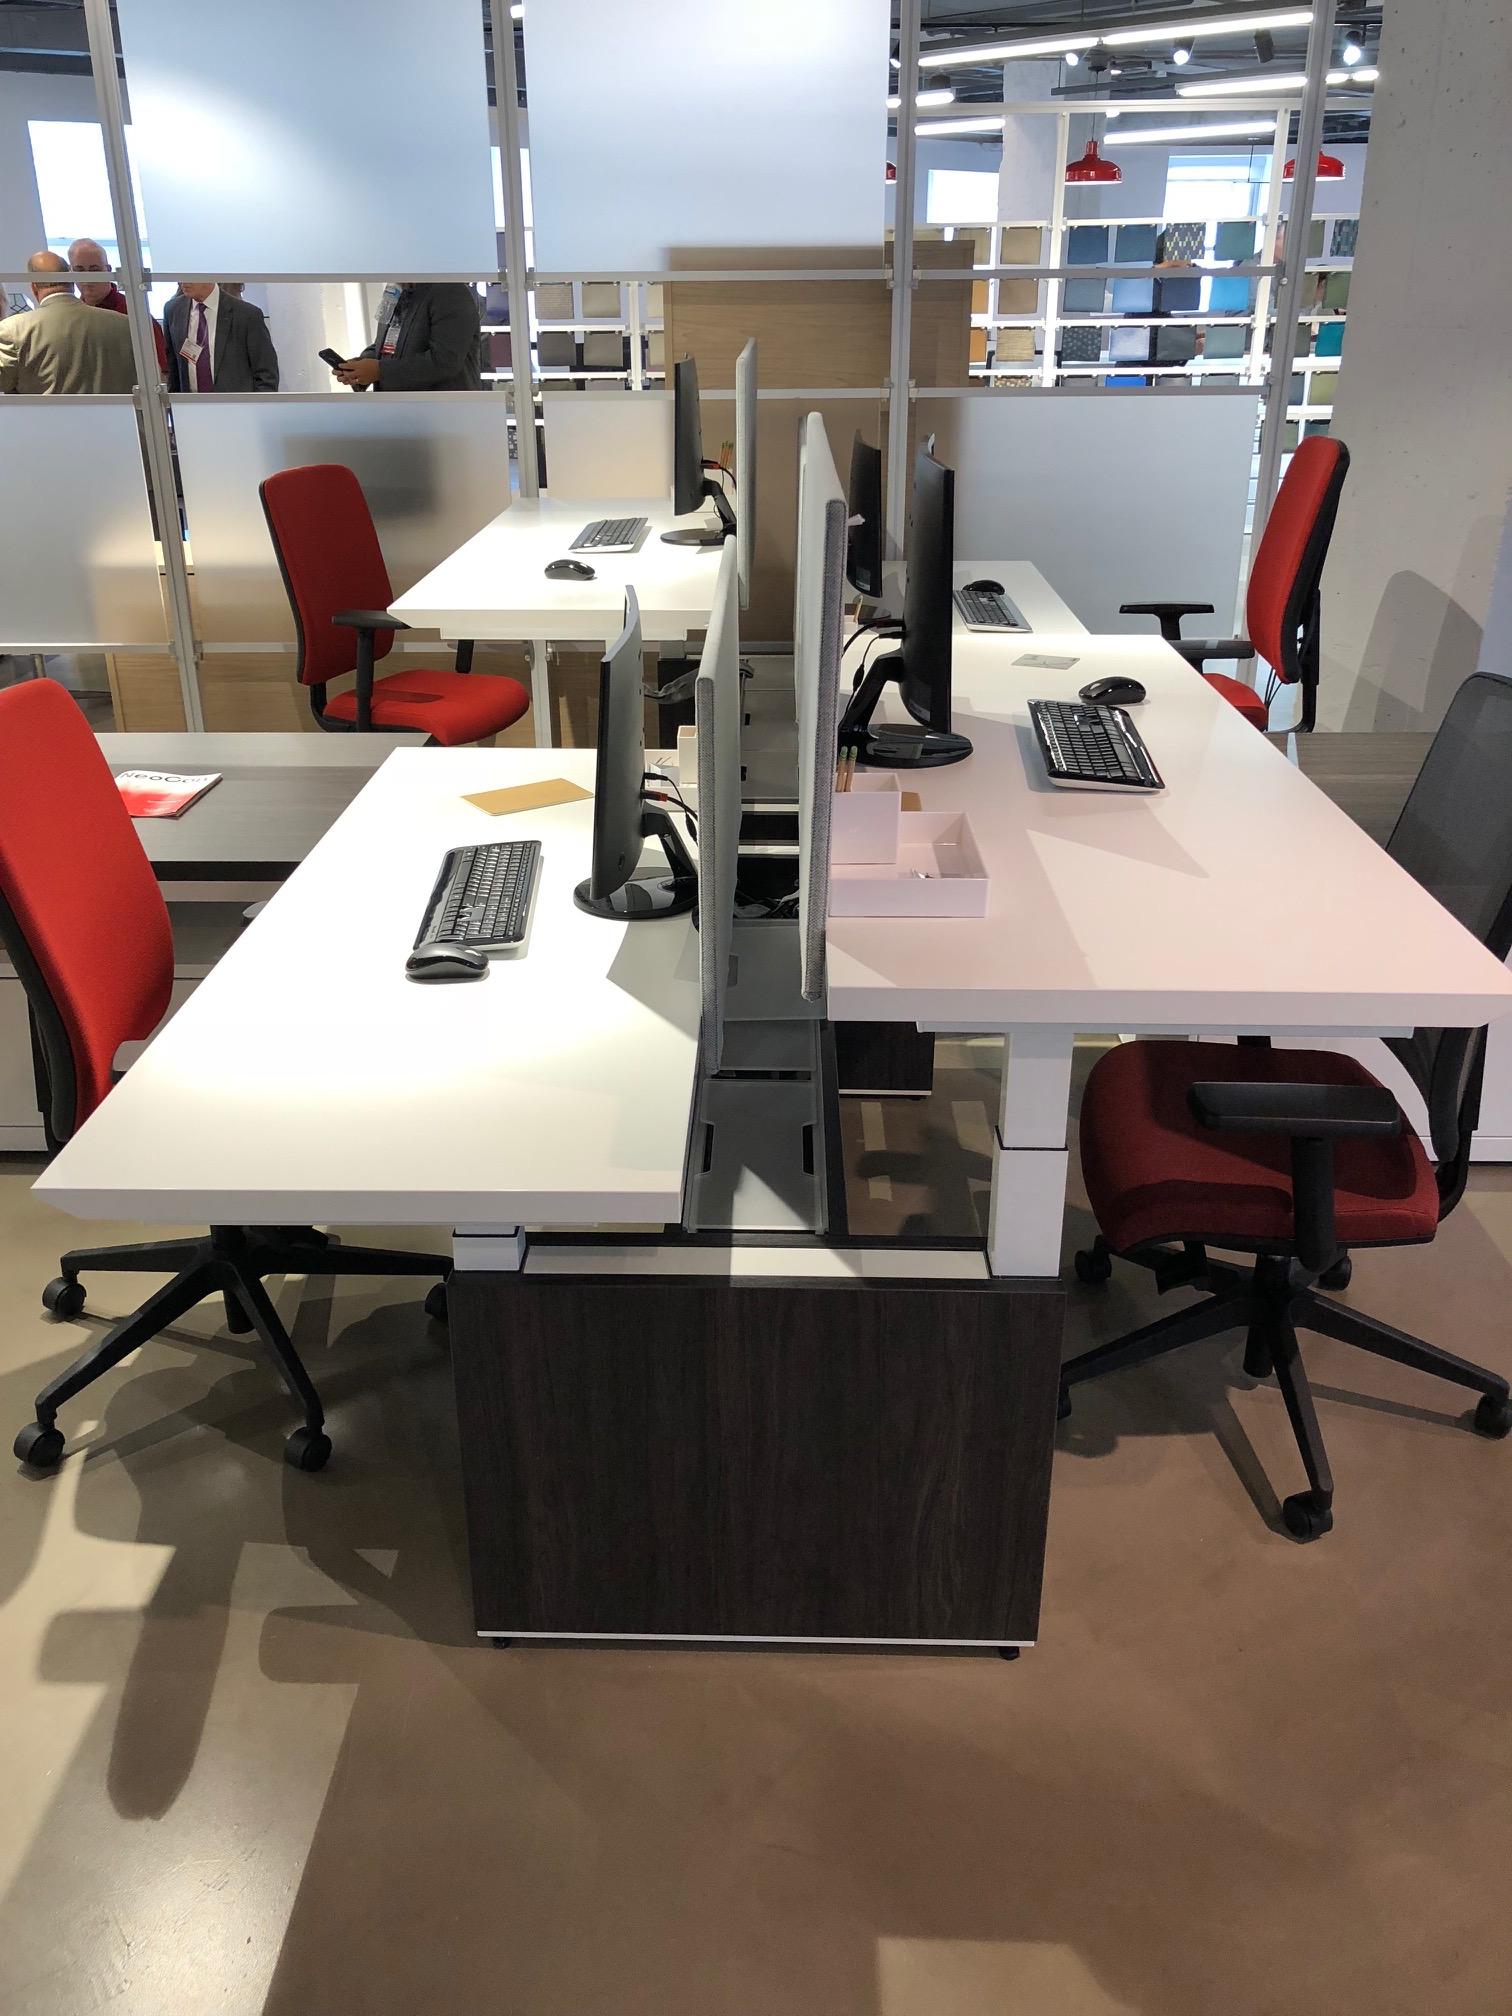 business-furniture-suppliers-in-sarasota-florida-7.png